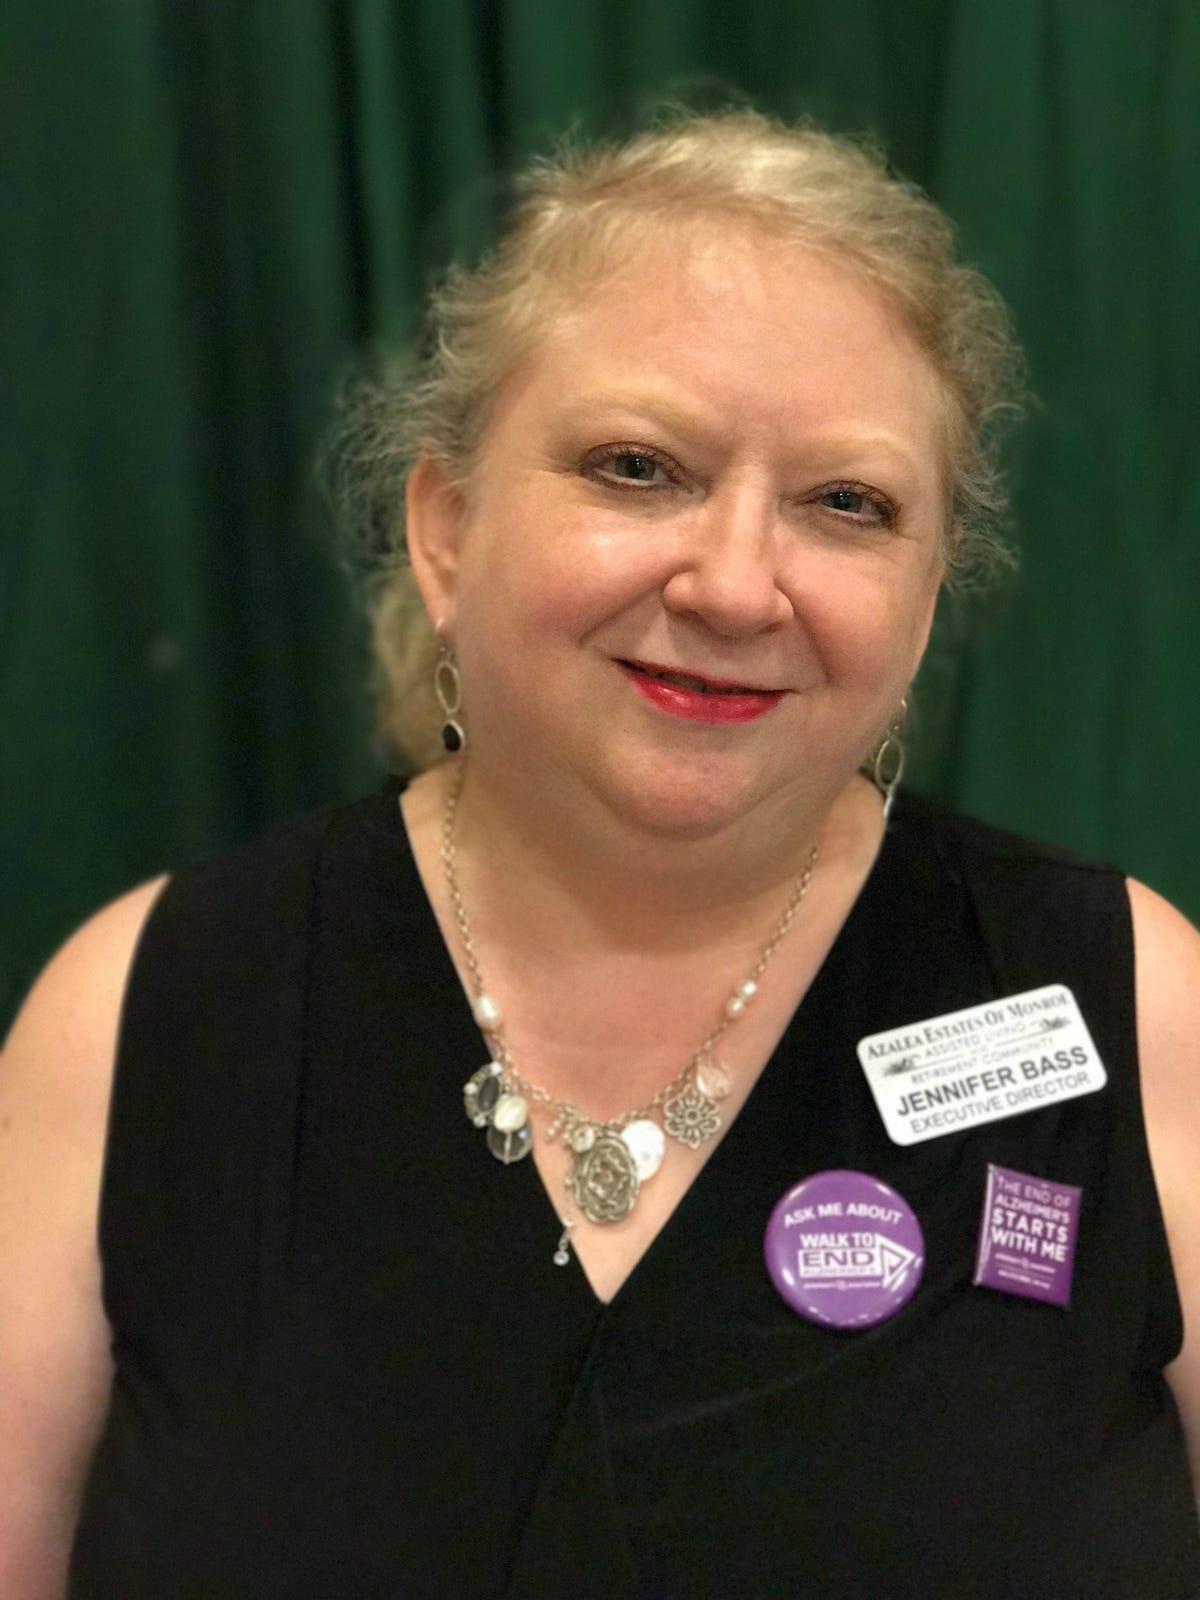 Childhood lessons led Azalea executive director to life of